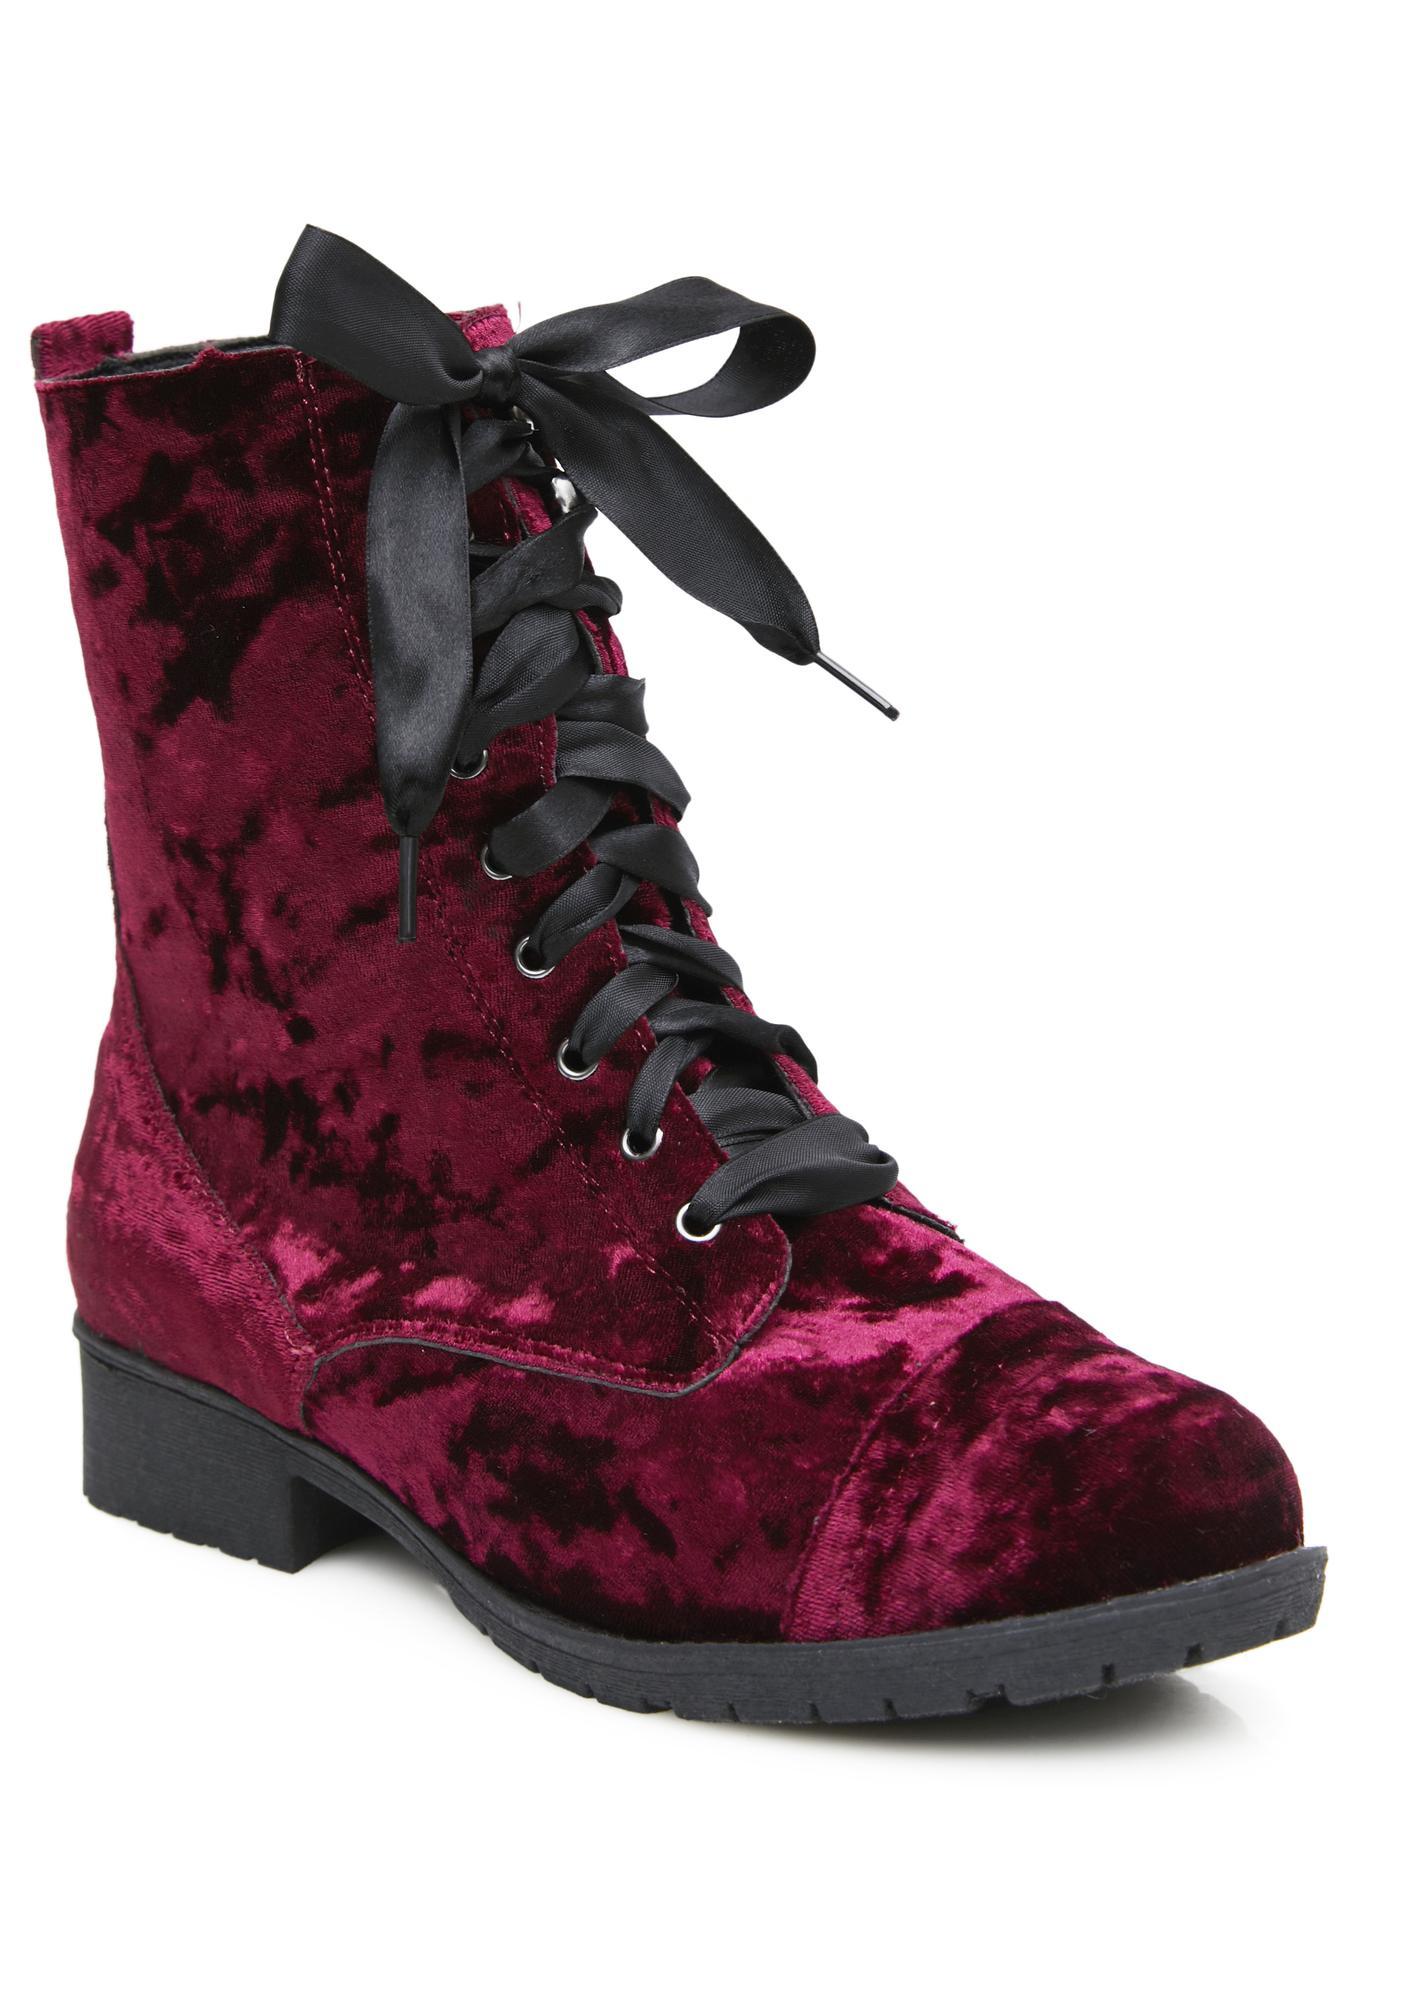 Crushed Romance Velvet Combat Boots